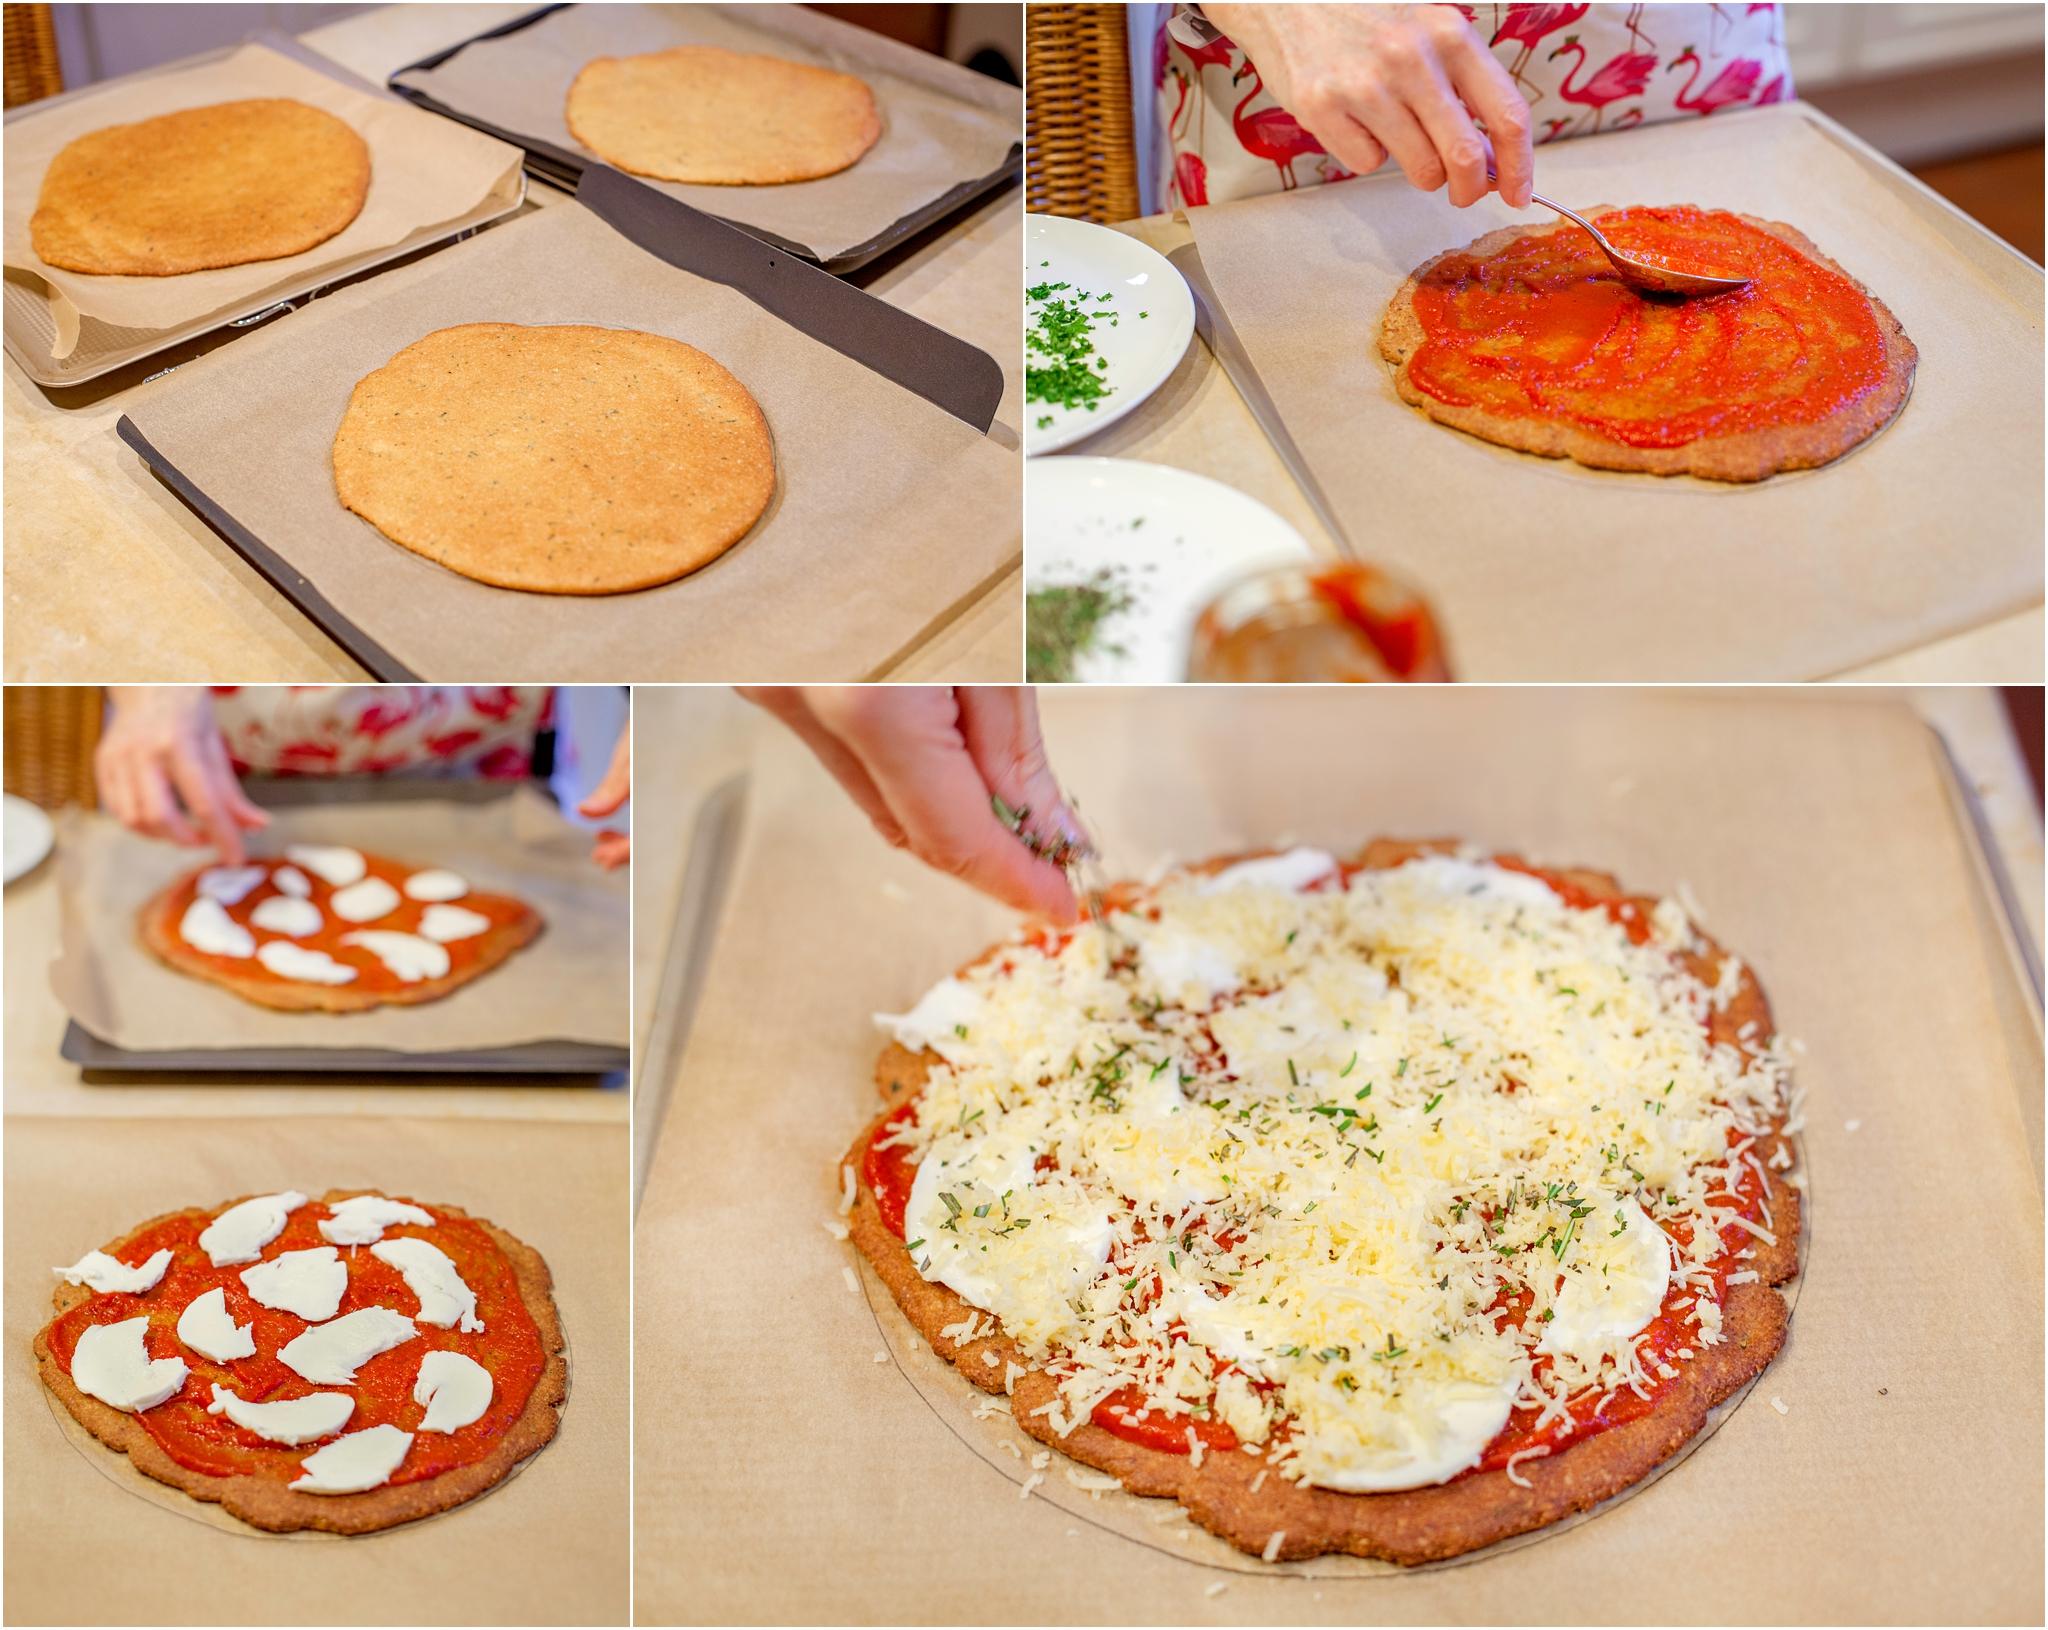 keto pizza prep .jpg